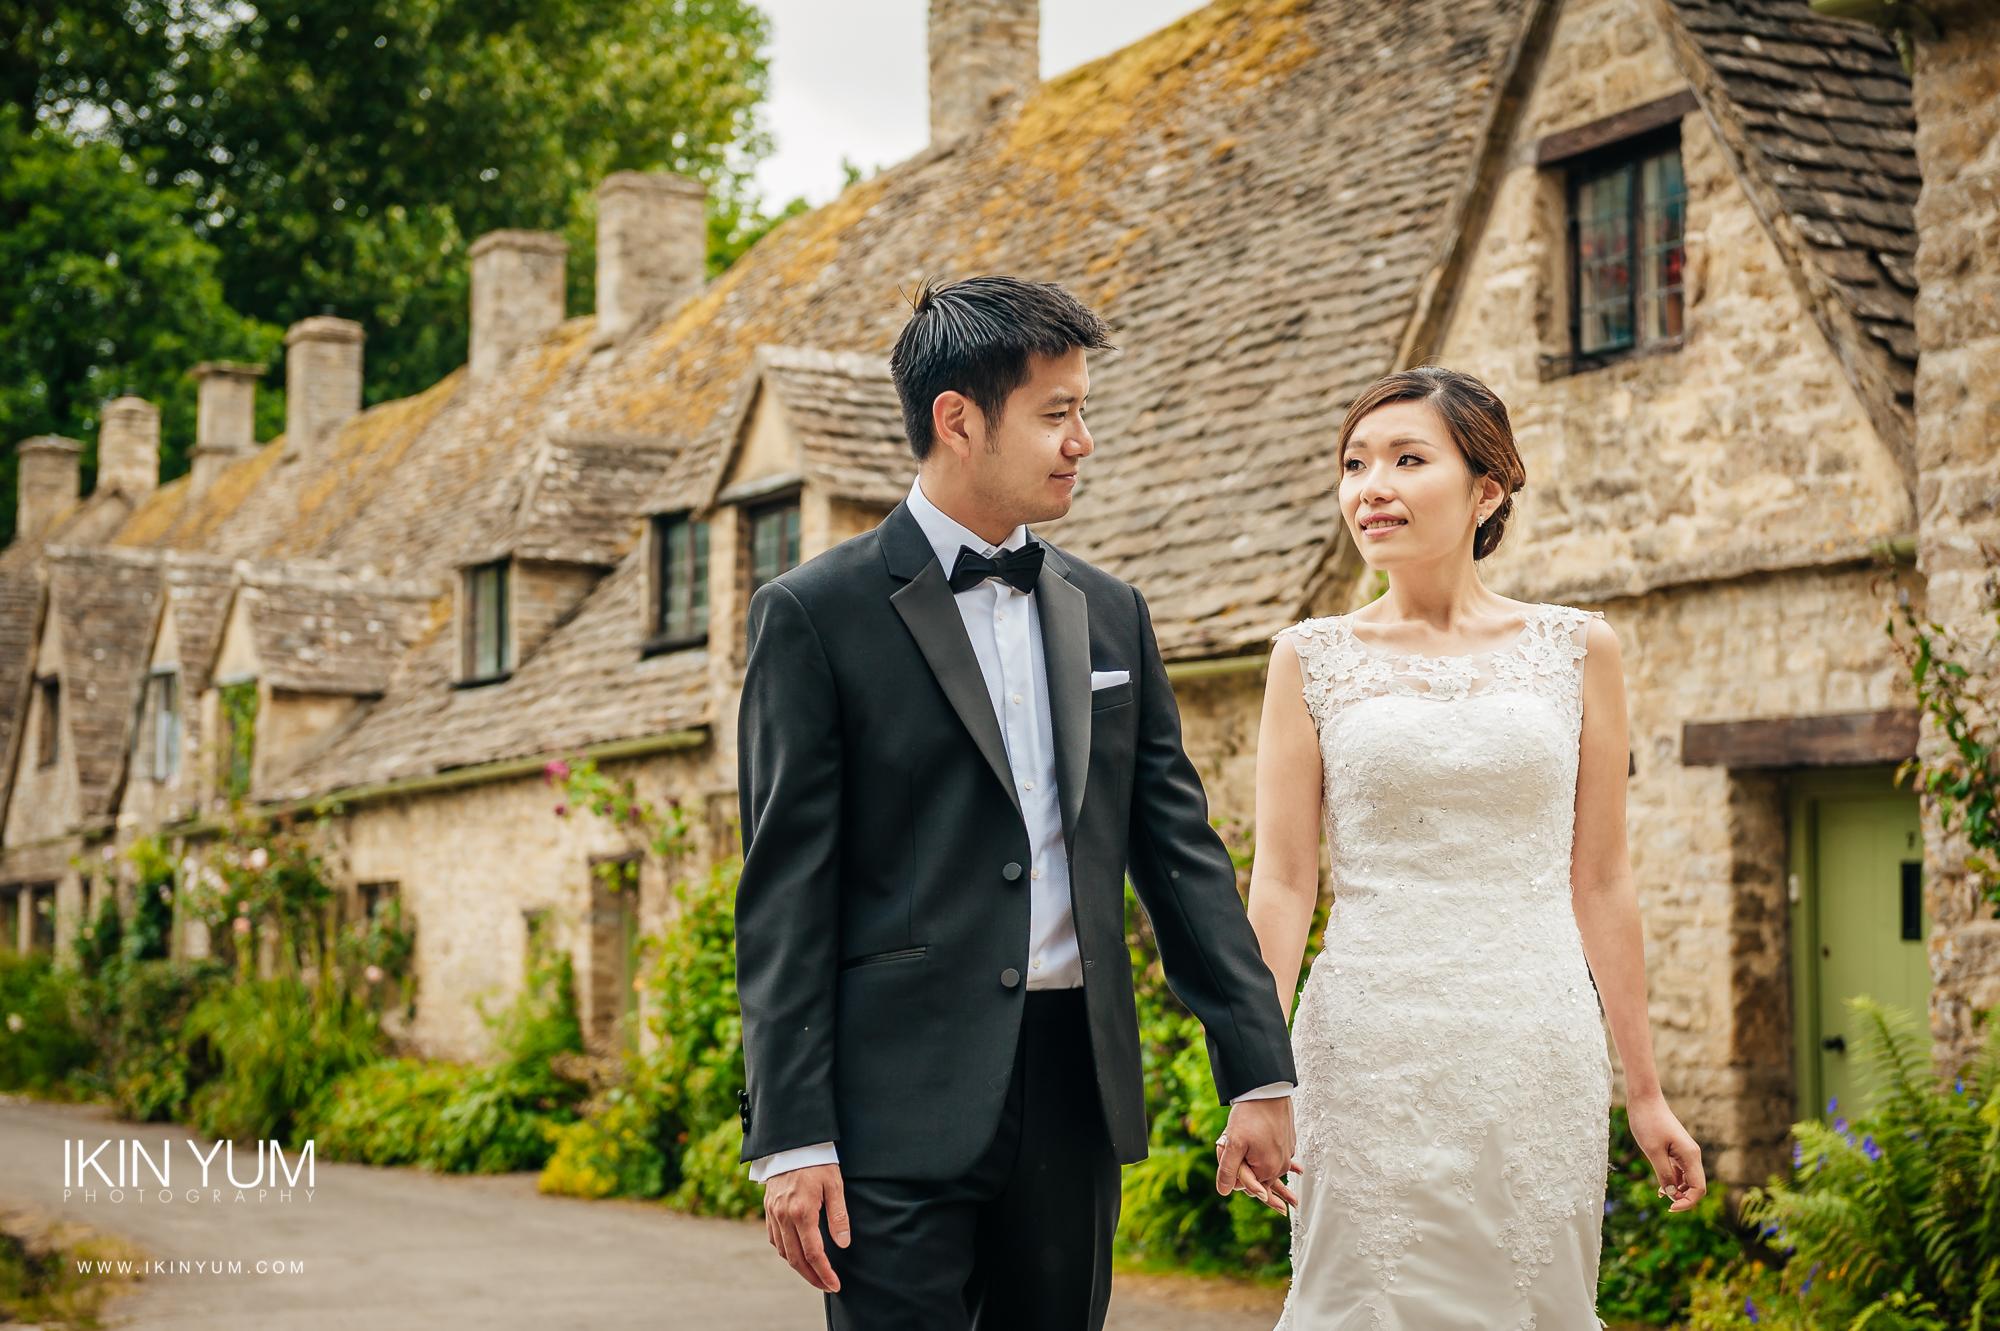 Carmen & Dennis Pre-Wedding Shoot - Ikin Yum Photography-017.jpg